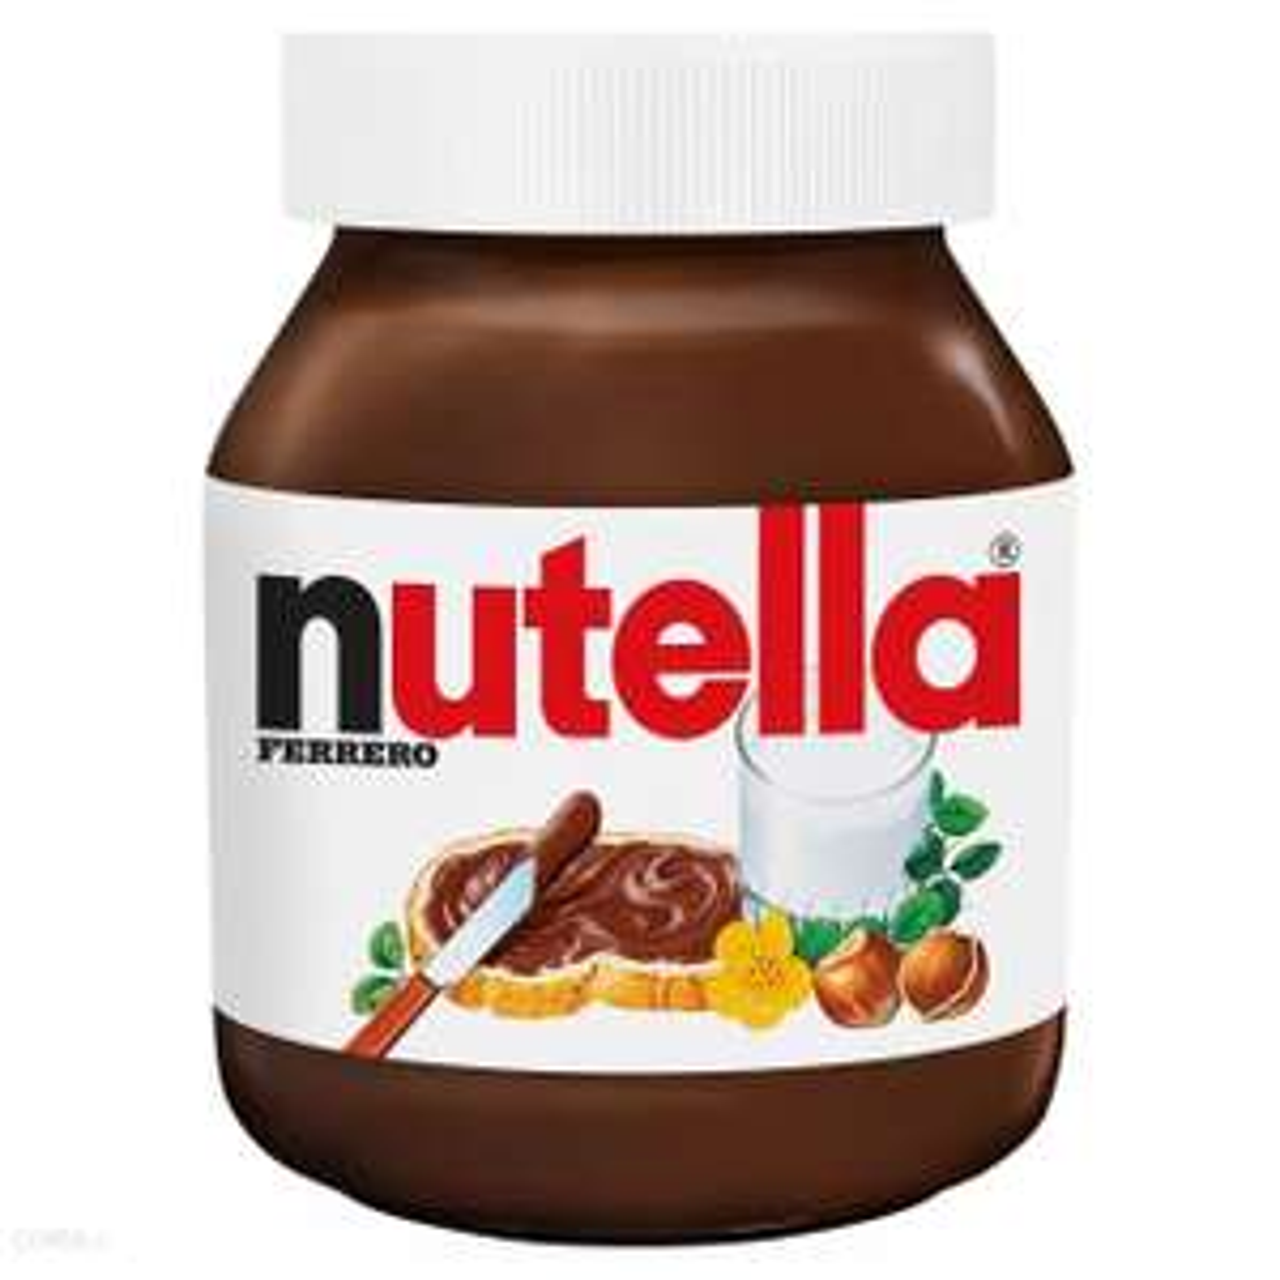 Nutella 350g @TESCO